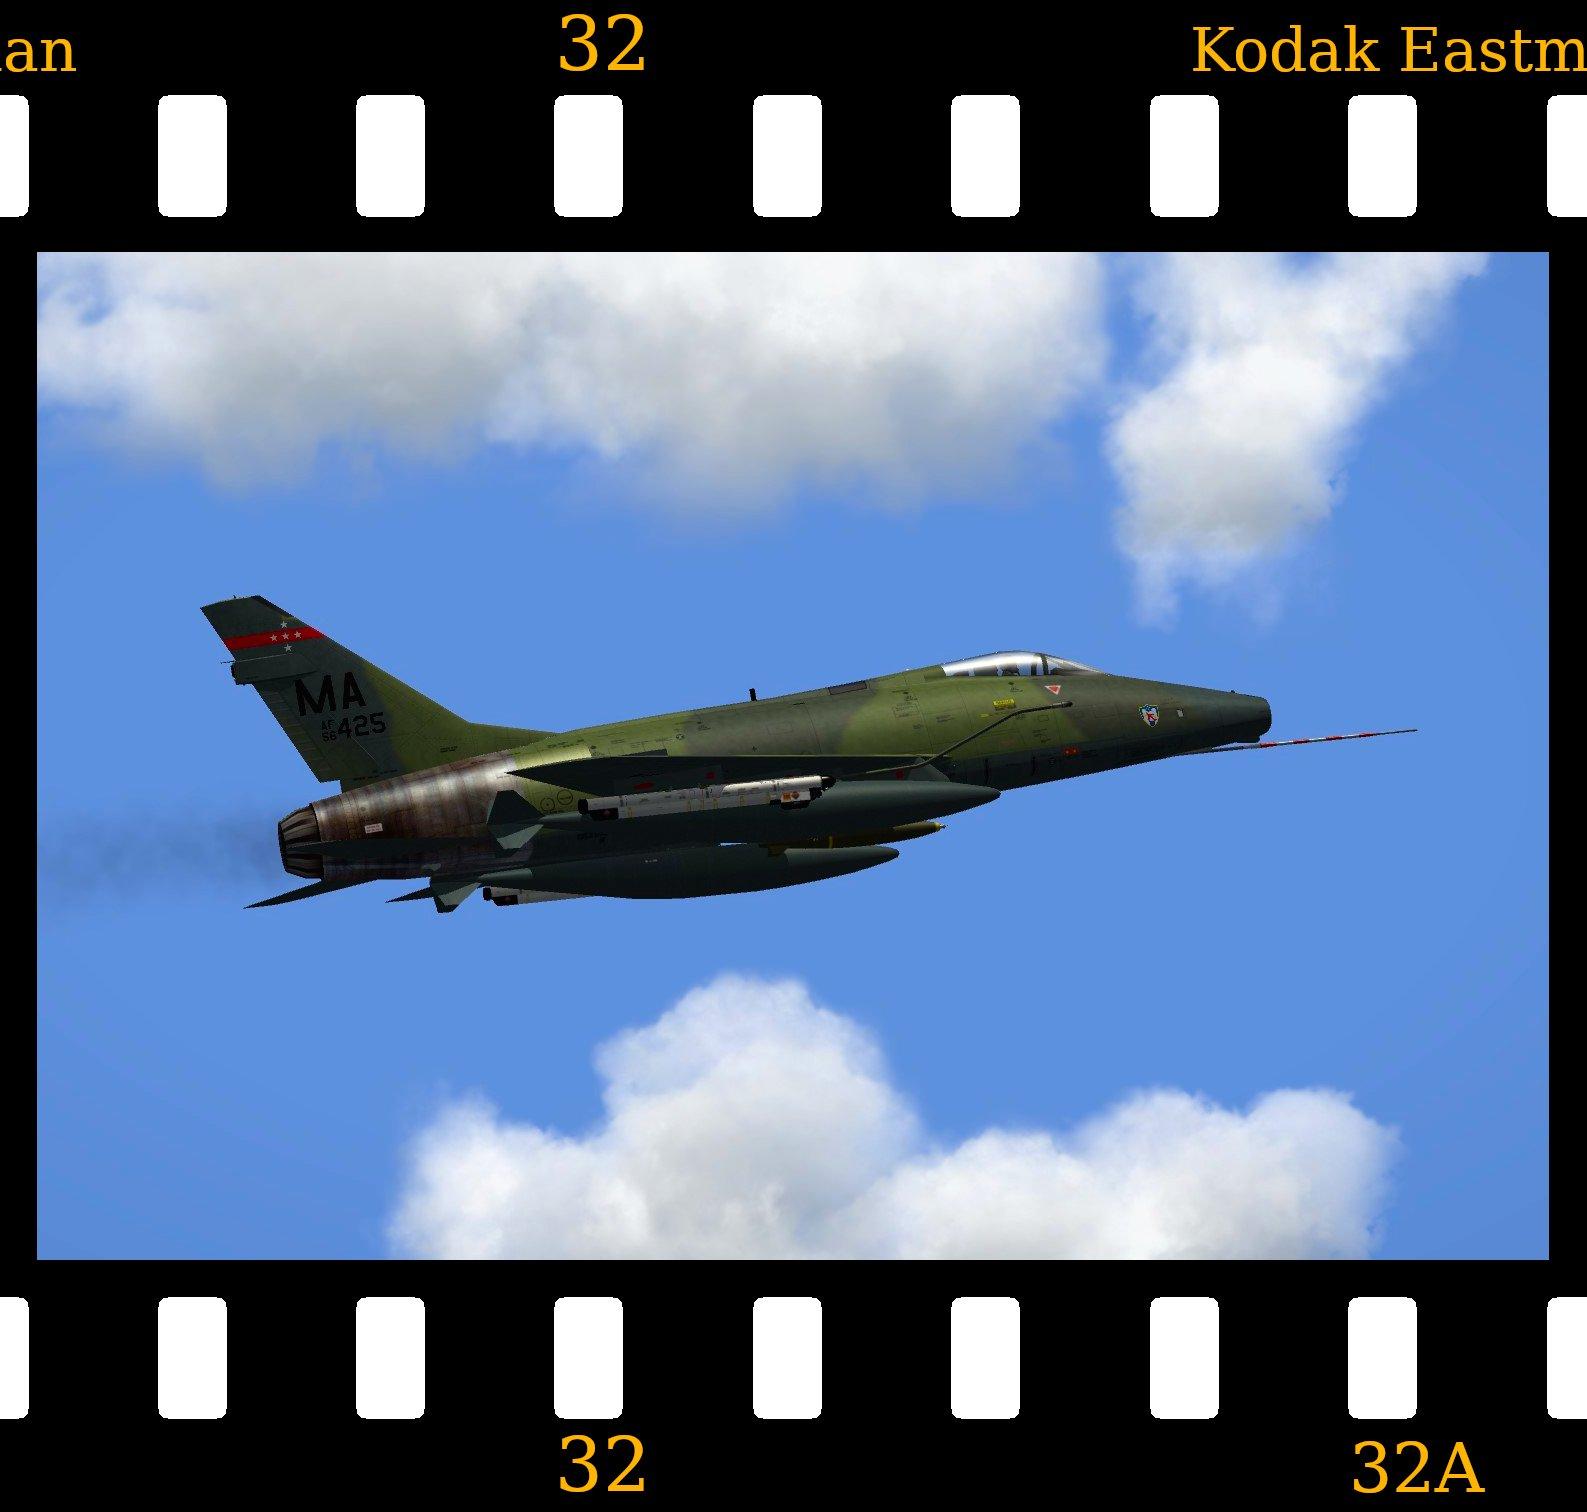 Fictional] North American F-100G Super Sabre - Thirdwire